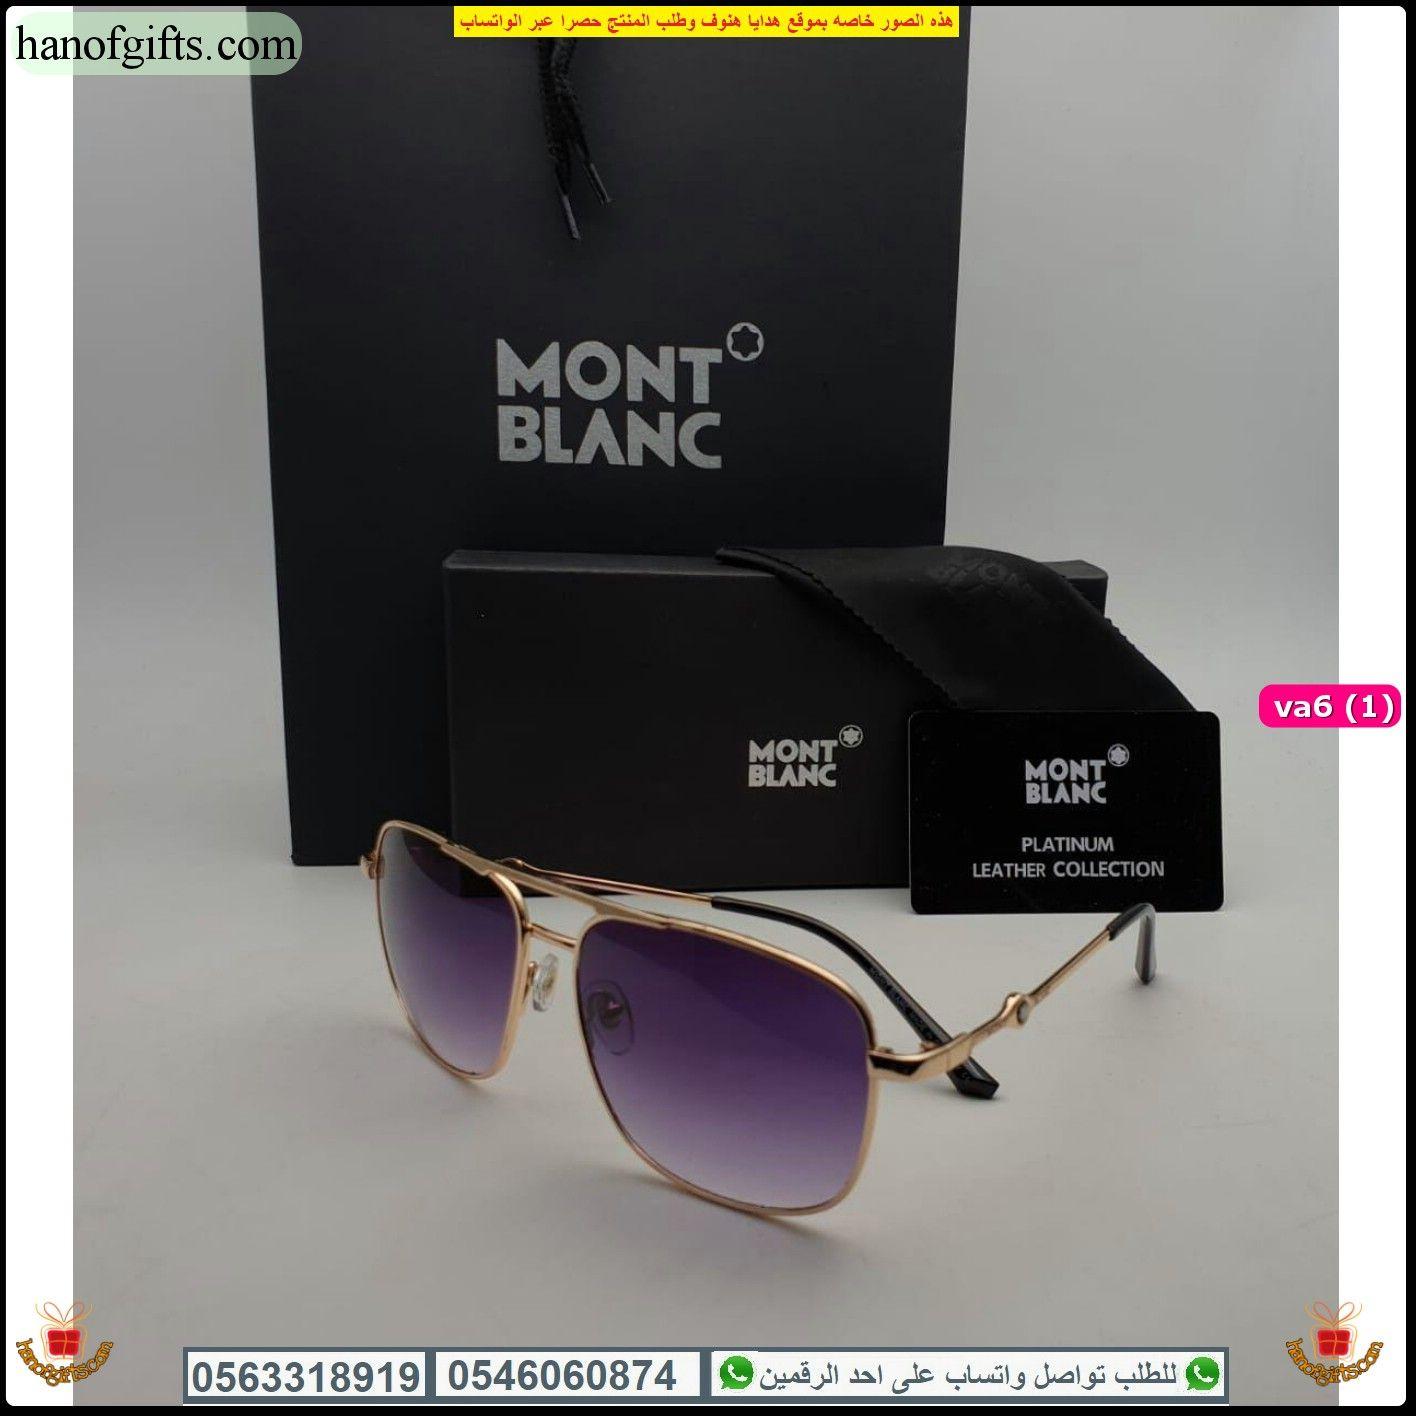 نظارات مونت بلانك رجاليه Mont Blanc مع جميع ملحقاتها و بنفس اسم الماركه هدايا هنوف Square Sunglass Leather Mont Blanc